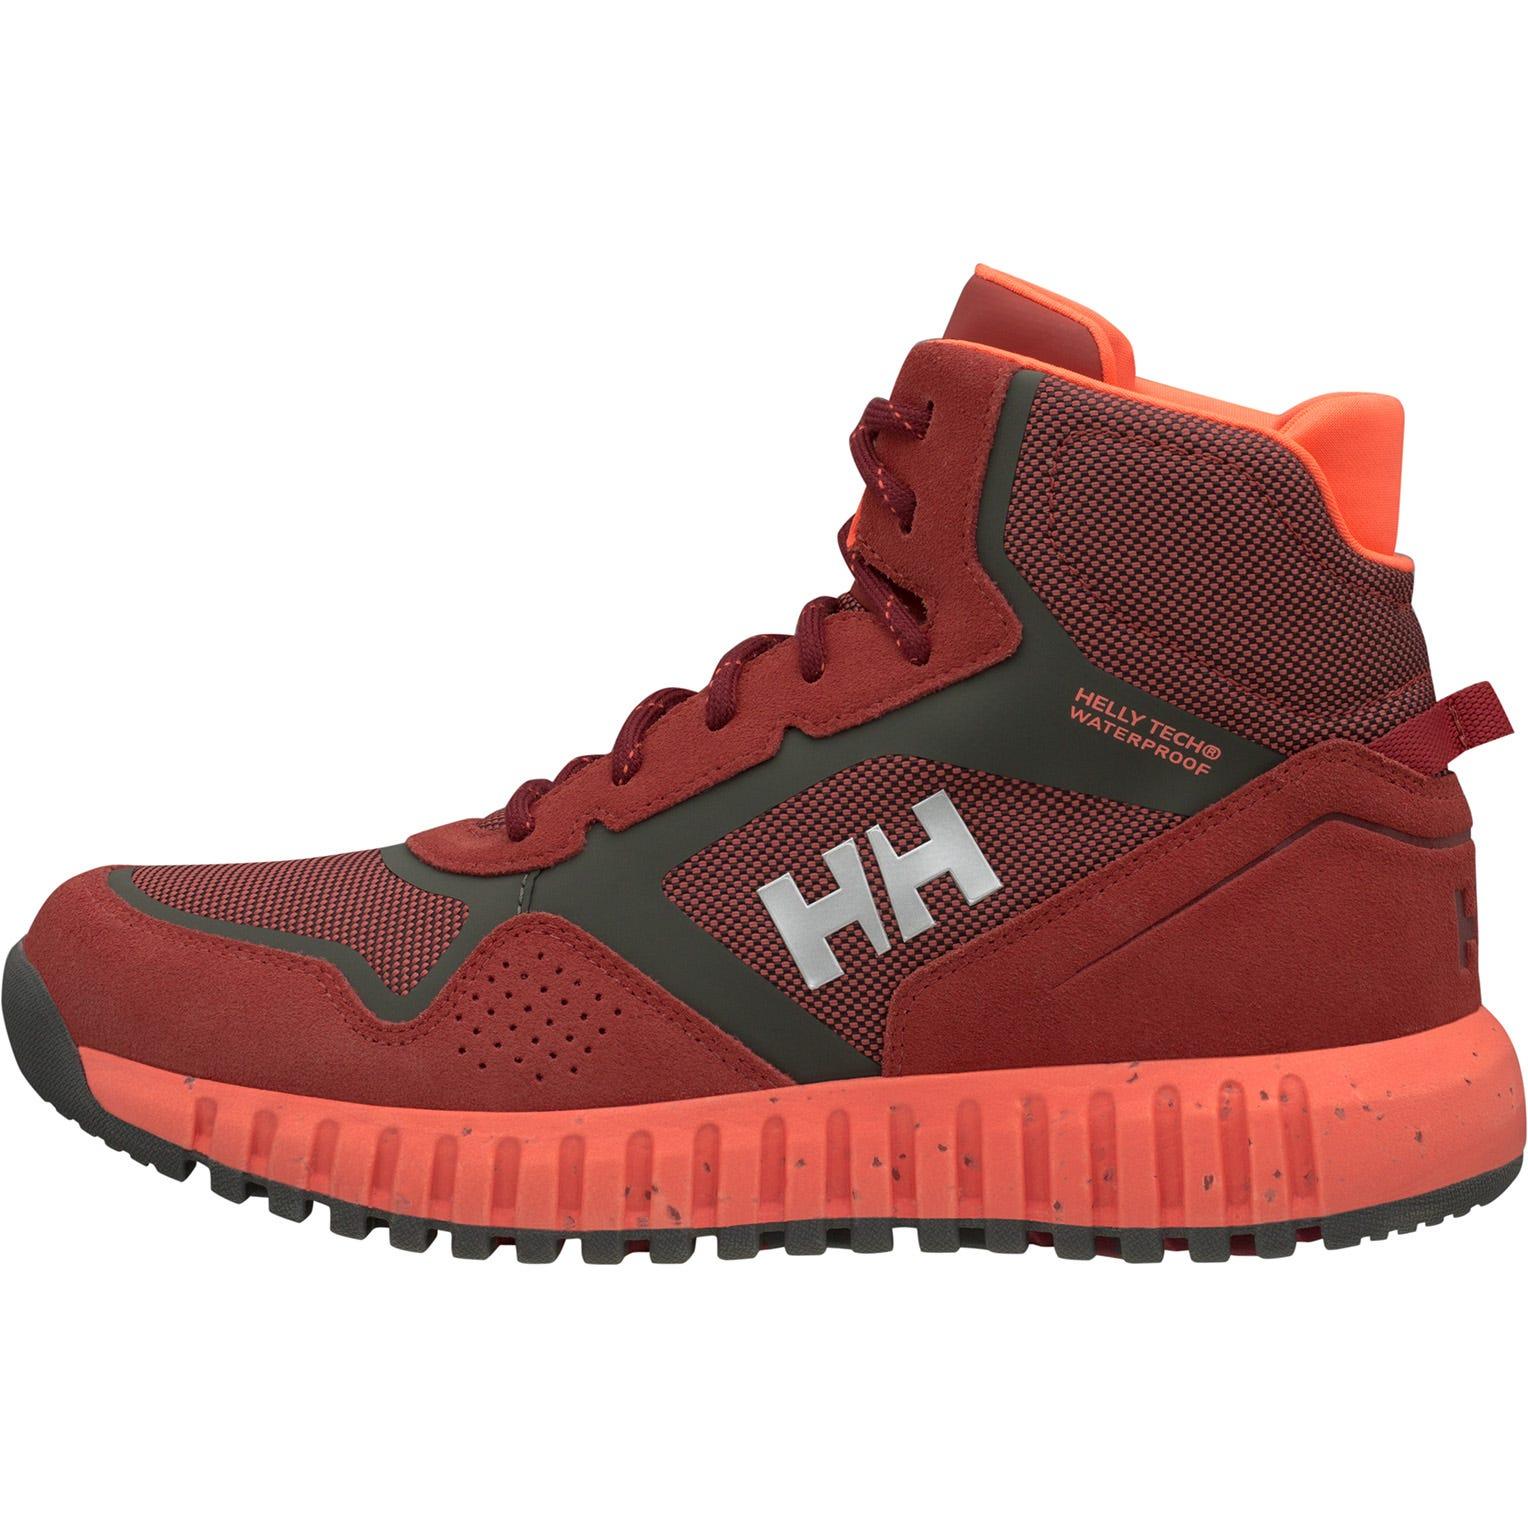 Helly Hansen W Monashee Ullr Ht Womens Hiking Boot Red 40/8.5